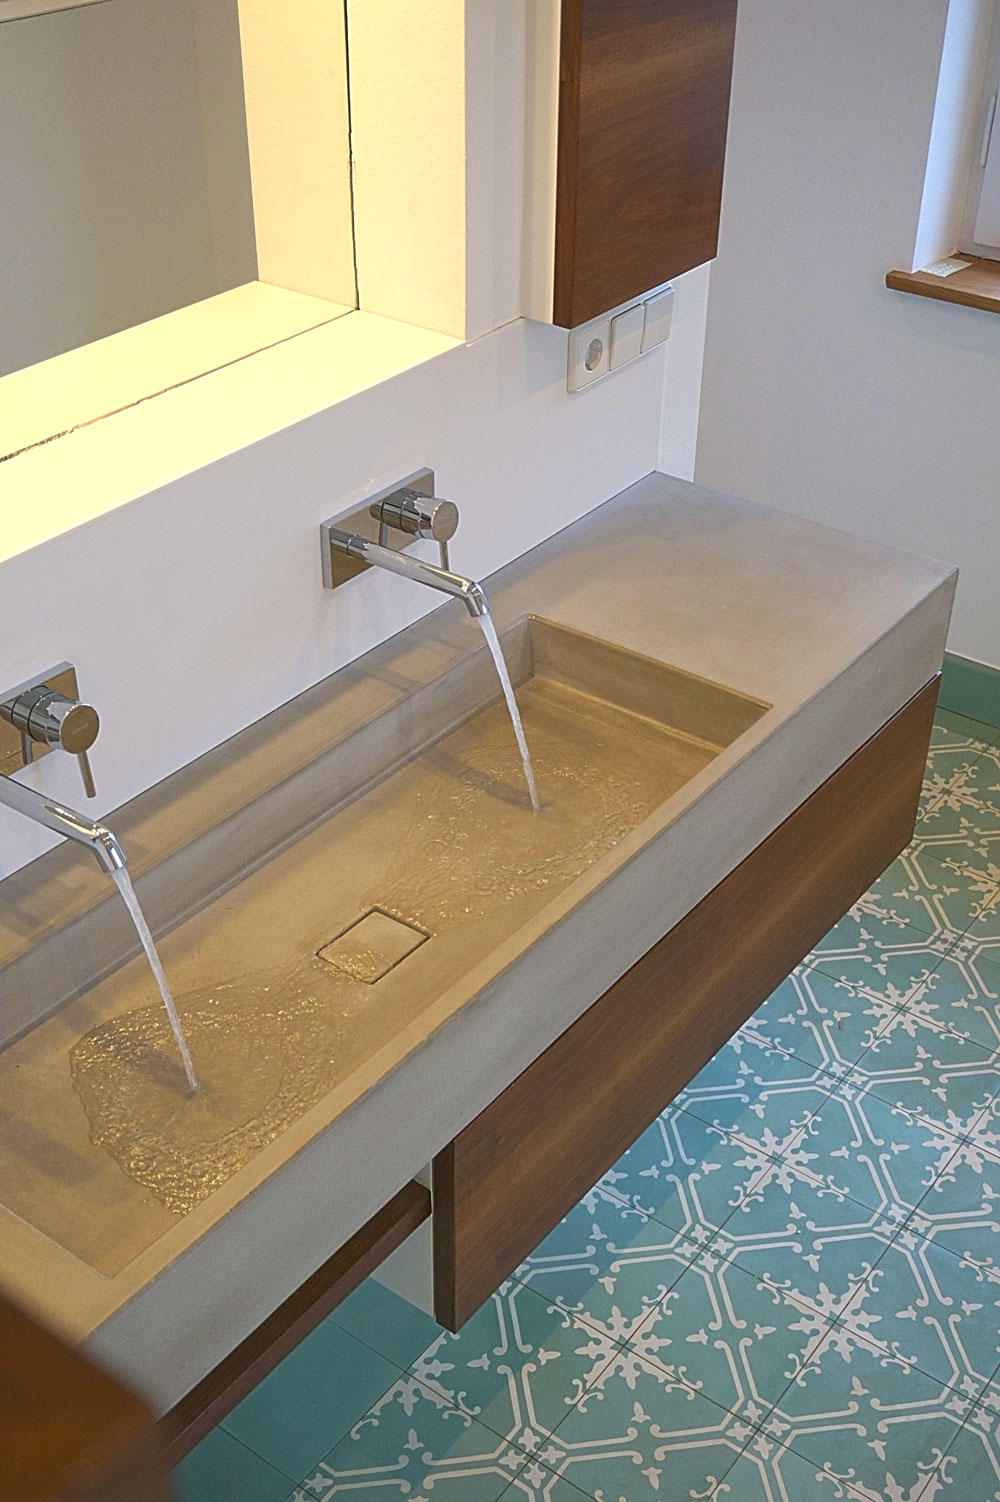 neues bad im denkmal waschtische aus beton betonm bel urbandesigners. Black Bedroom Furniture Sets. Home Design Ideas